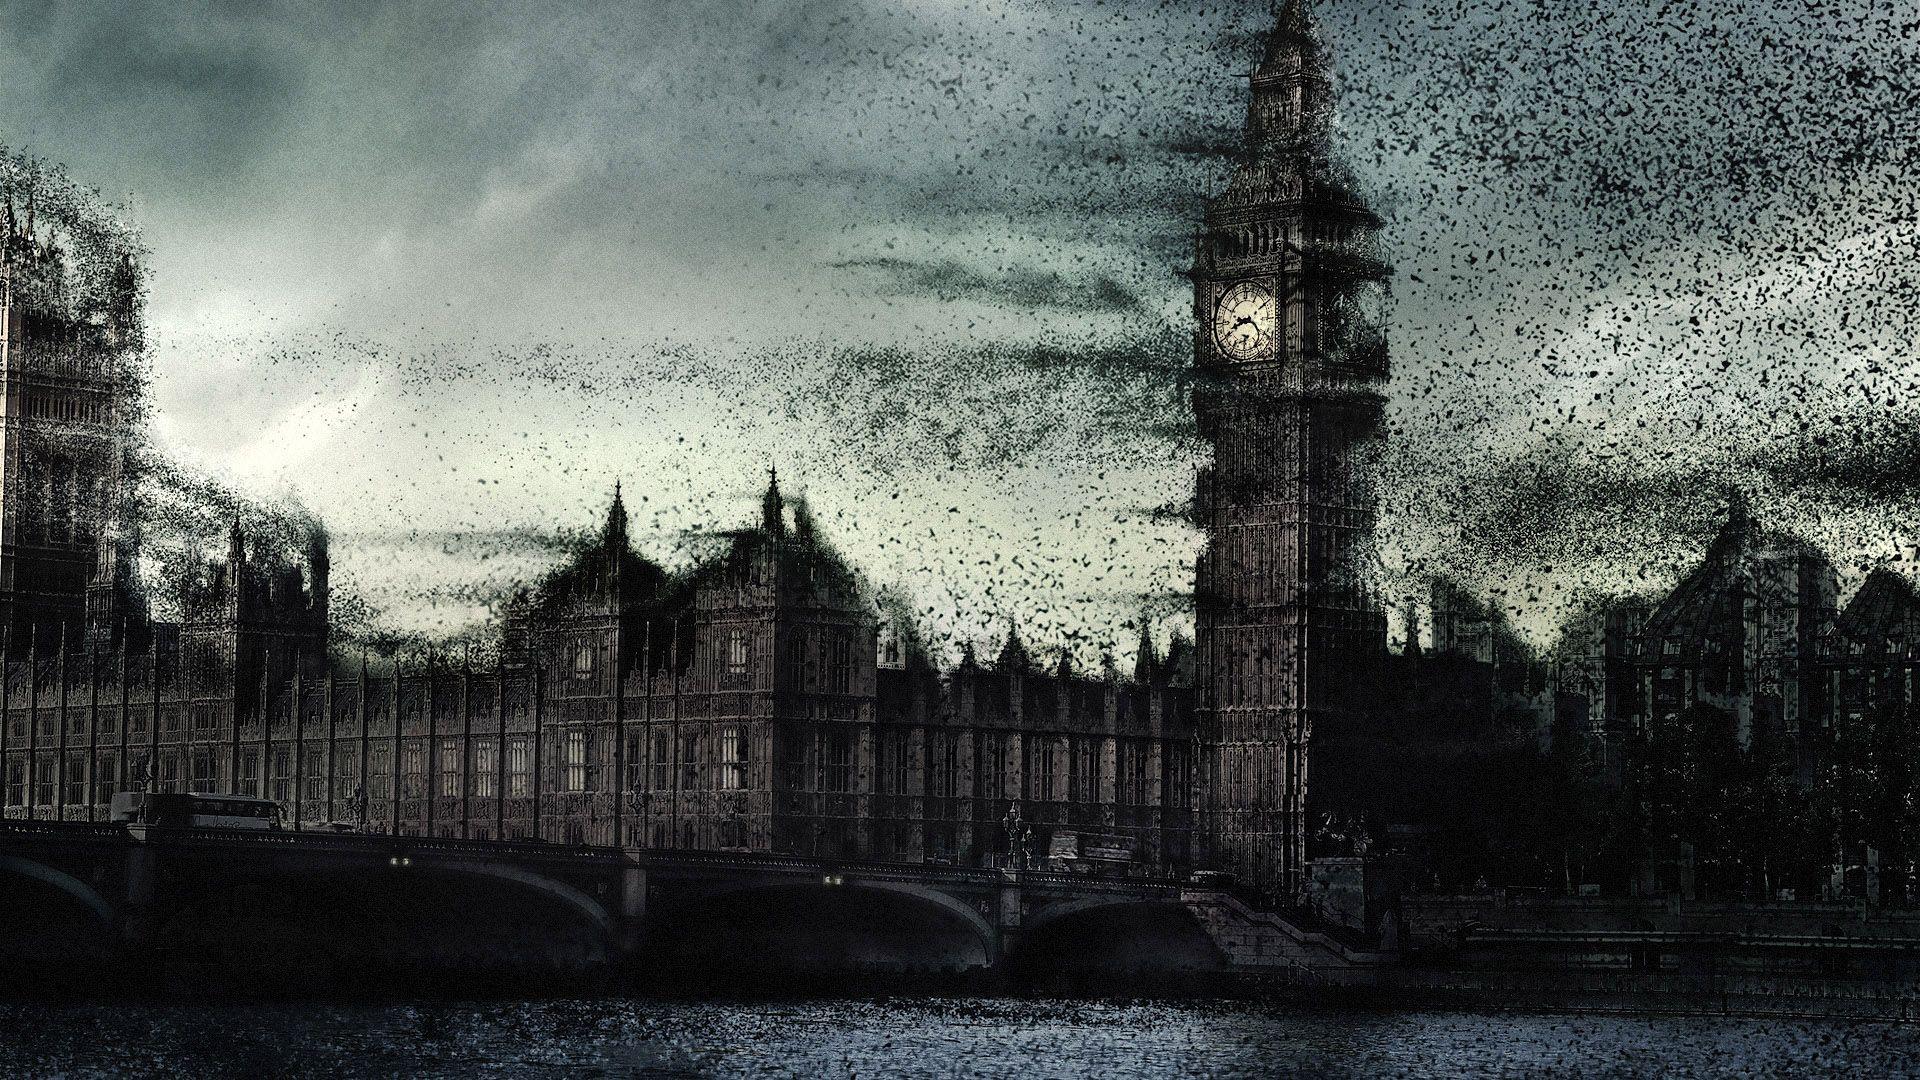 Dark City Backgrounds - Wallpaper Cave